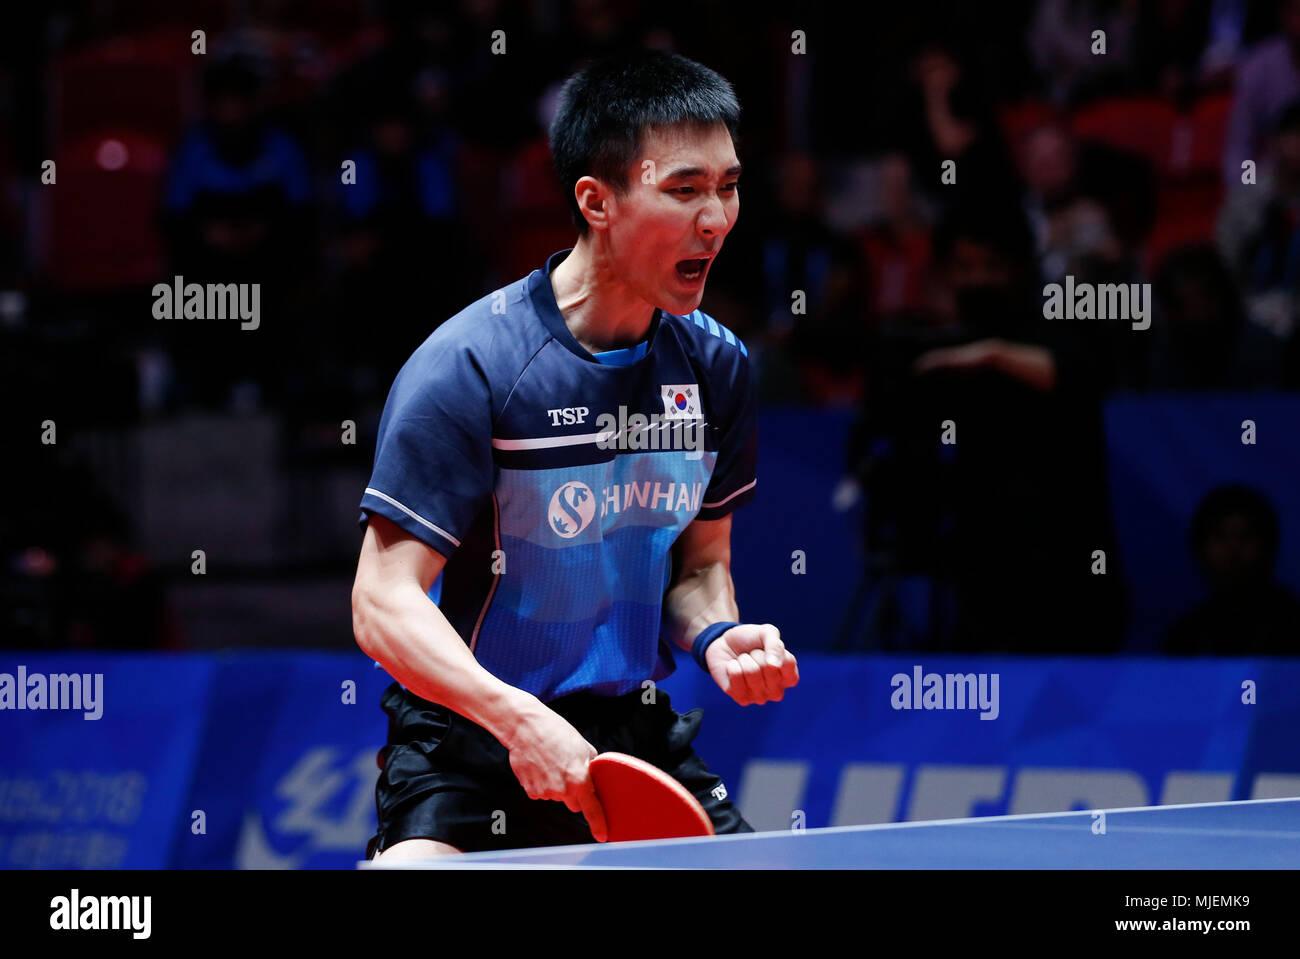 (180505) -- HALMSTAD, May 5, 2018 (Xinhua) -- Lee Sangsu of South Korea reacts during the Men's group quarterfinal match against Jun Mizutani of Japan at the 2018 World Team Table Tennis Championships in Halmstad, Sweden, May 4, 2018. (Xinhua/Ye Pingfan) - Stock Image